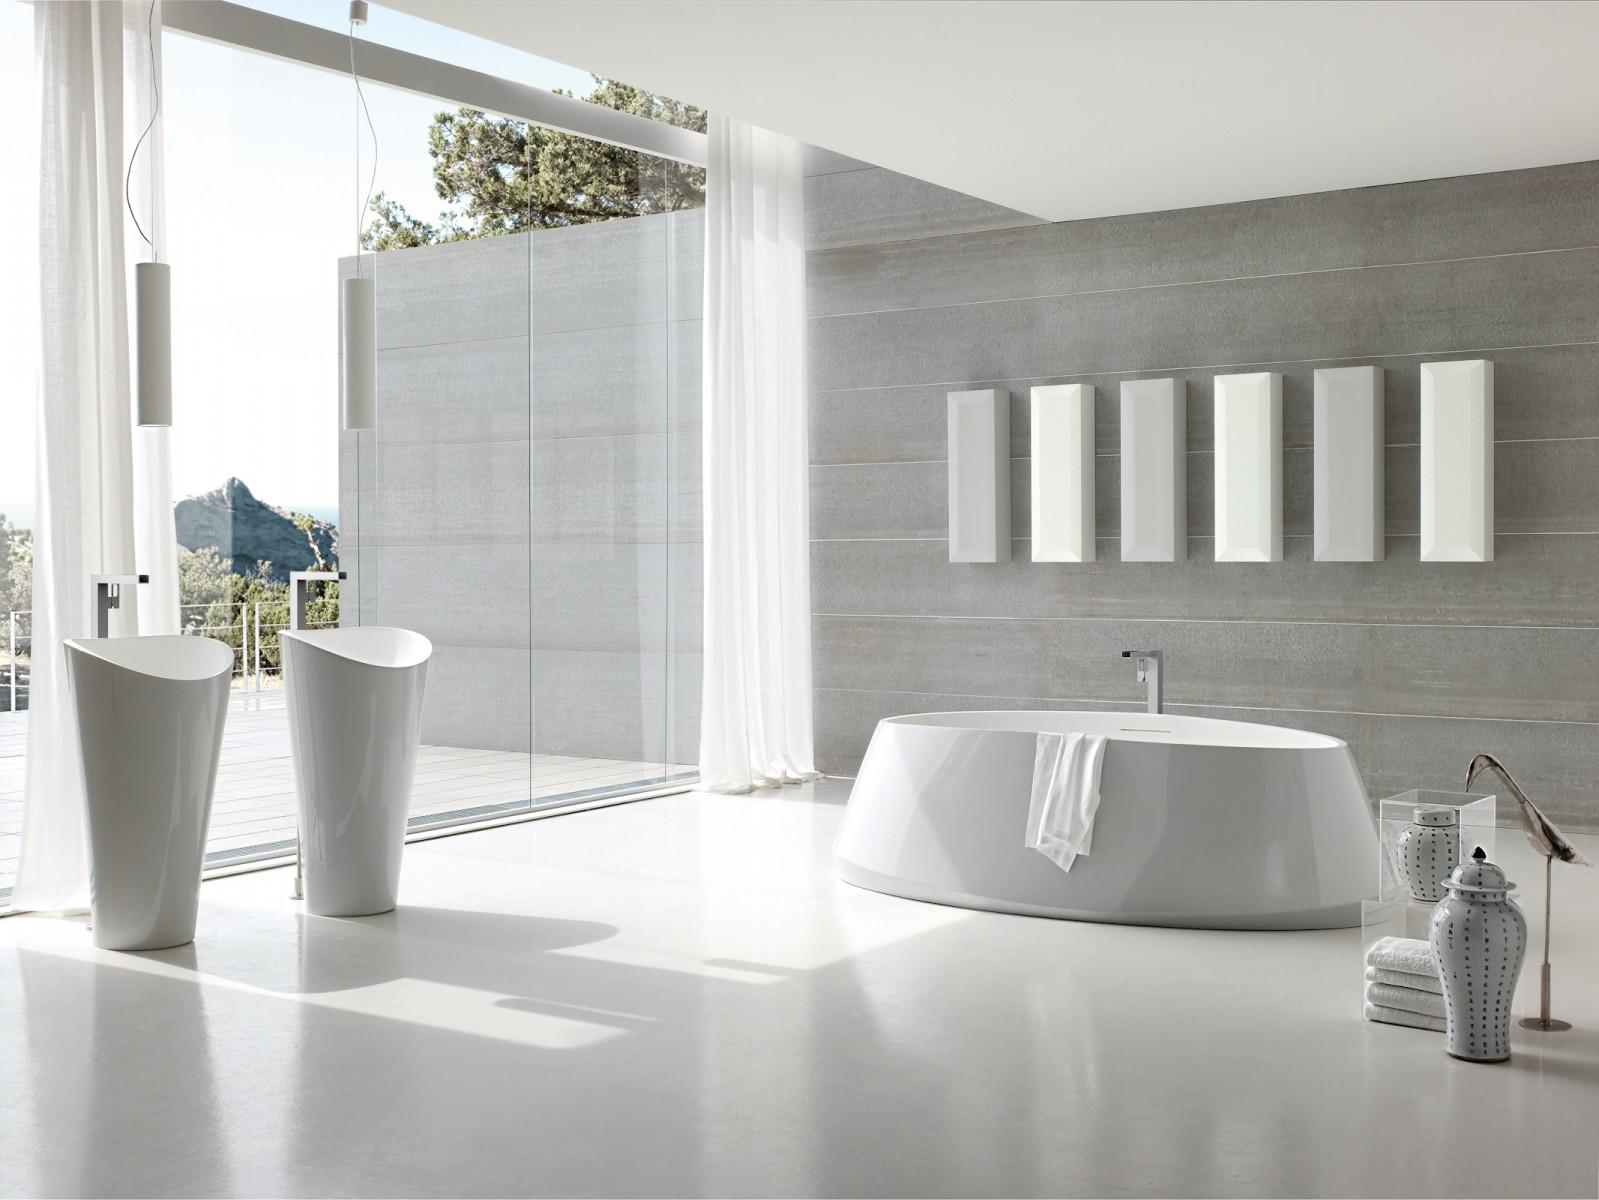 Modern Bathroom Bella Vista Bathware - New bathroom looks